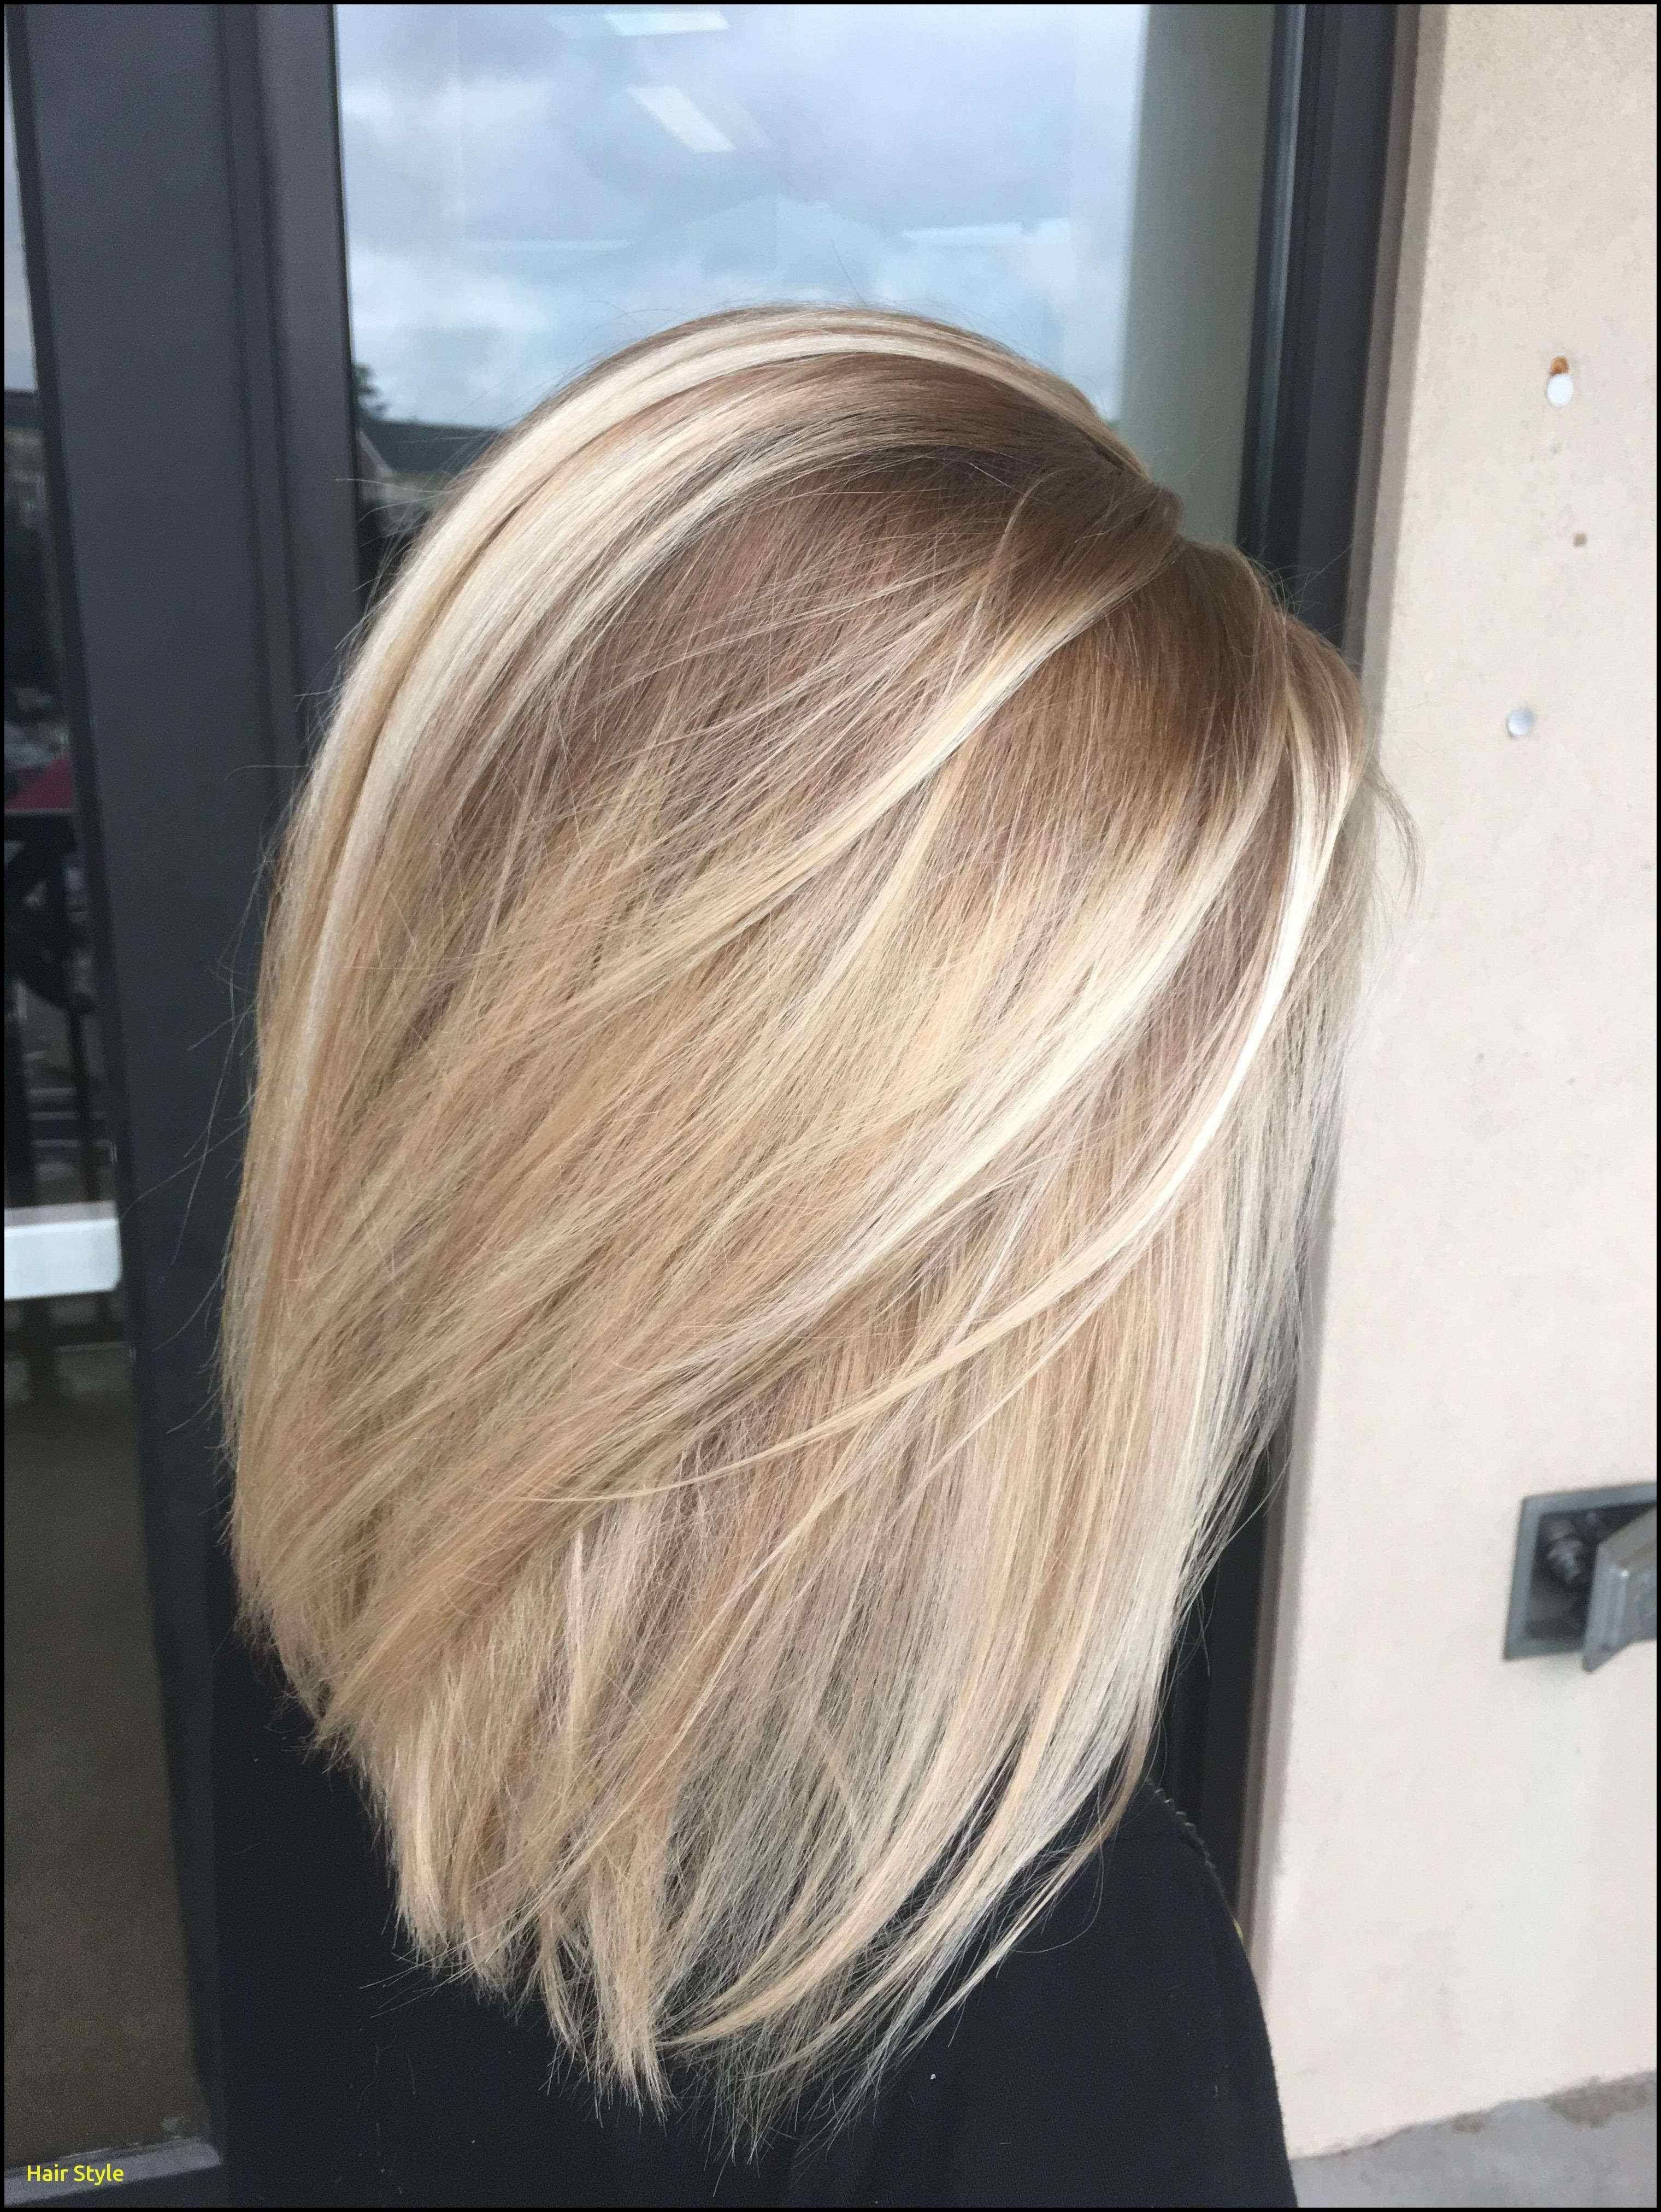 Neue Kurze Blonde Haar Dunkelwurzeln Haartrends 2018 Pinterest